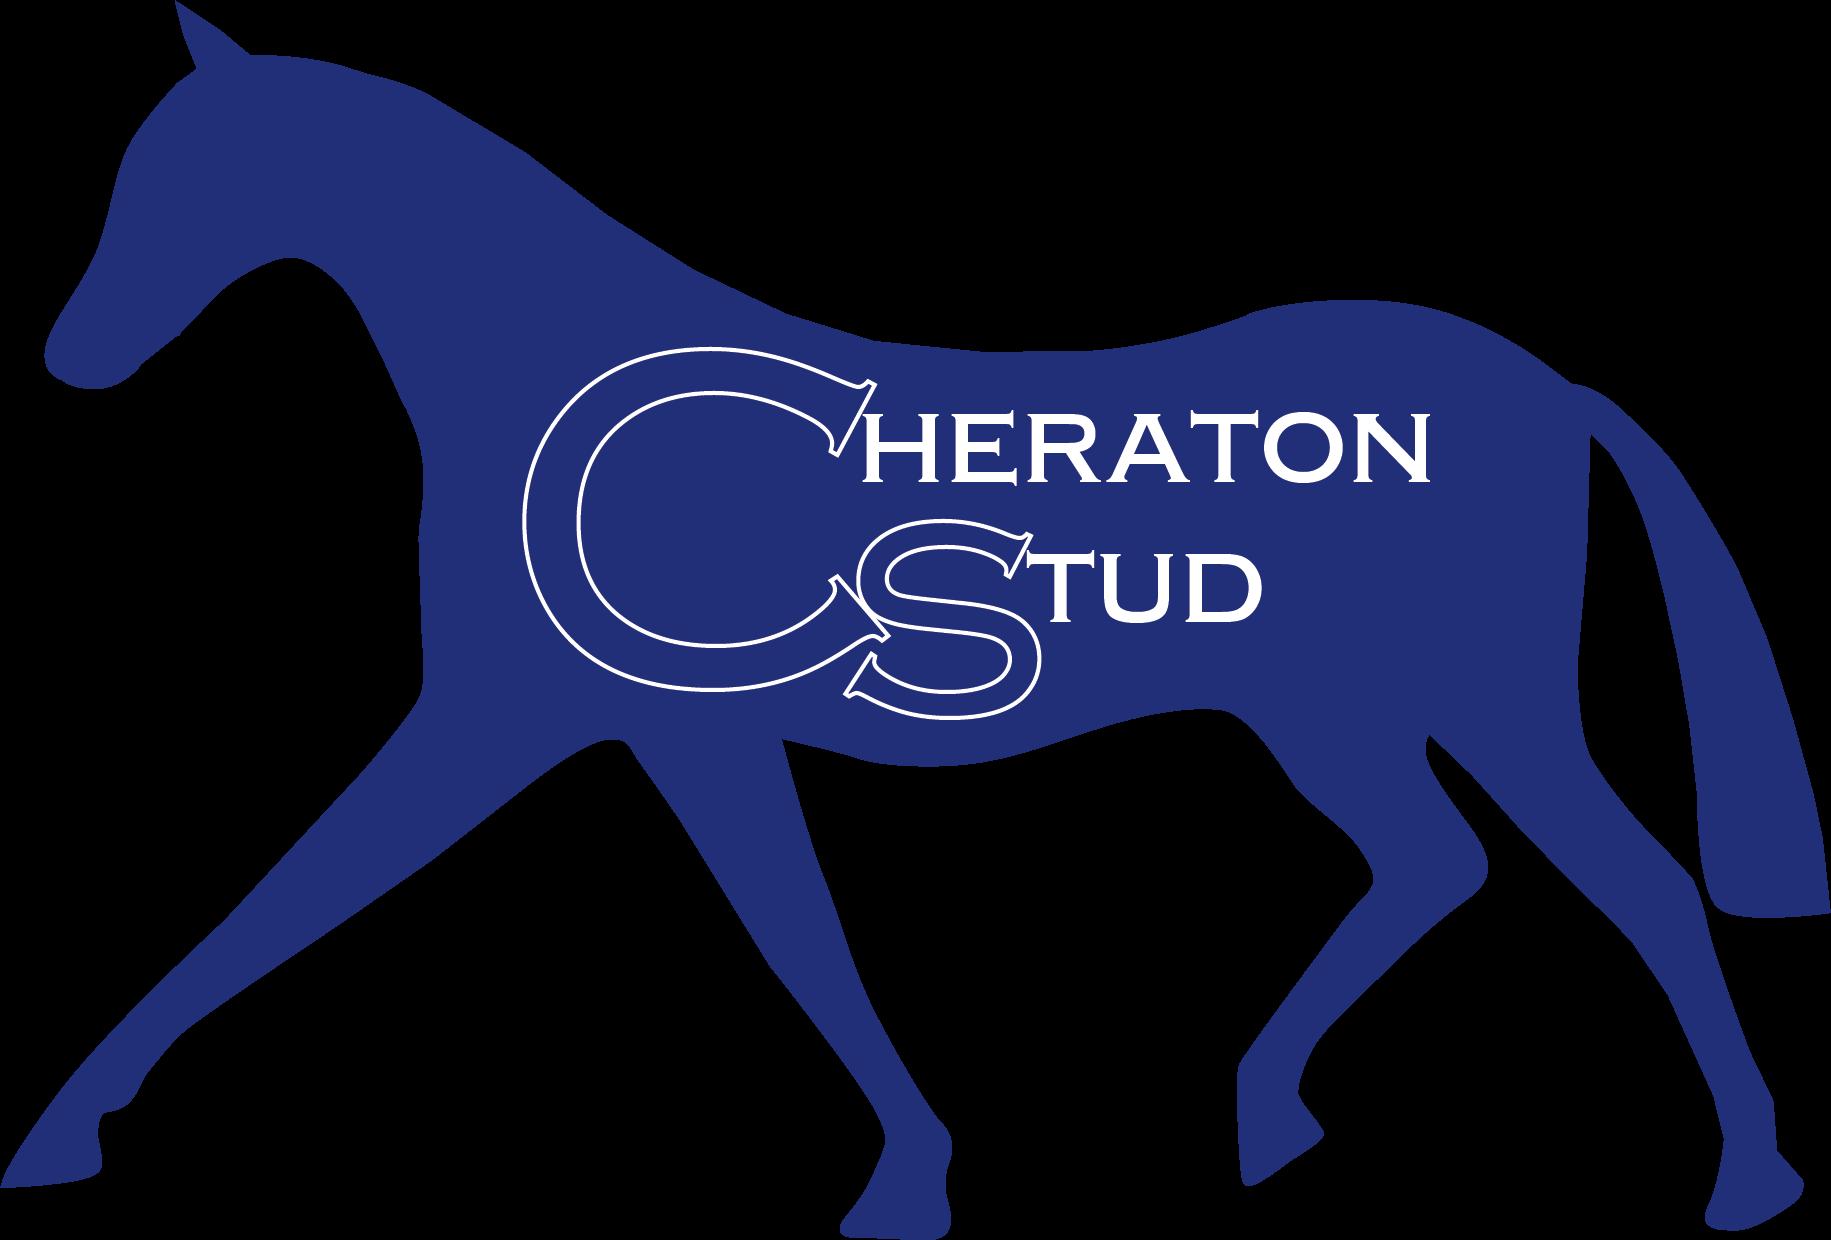 Cheraton Stud